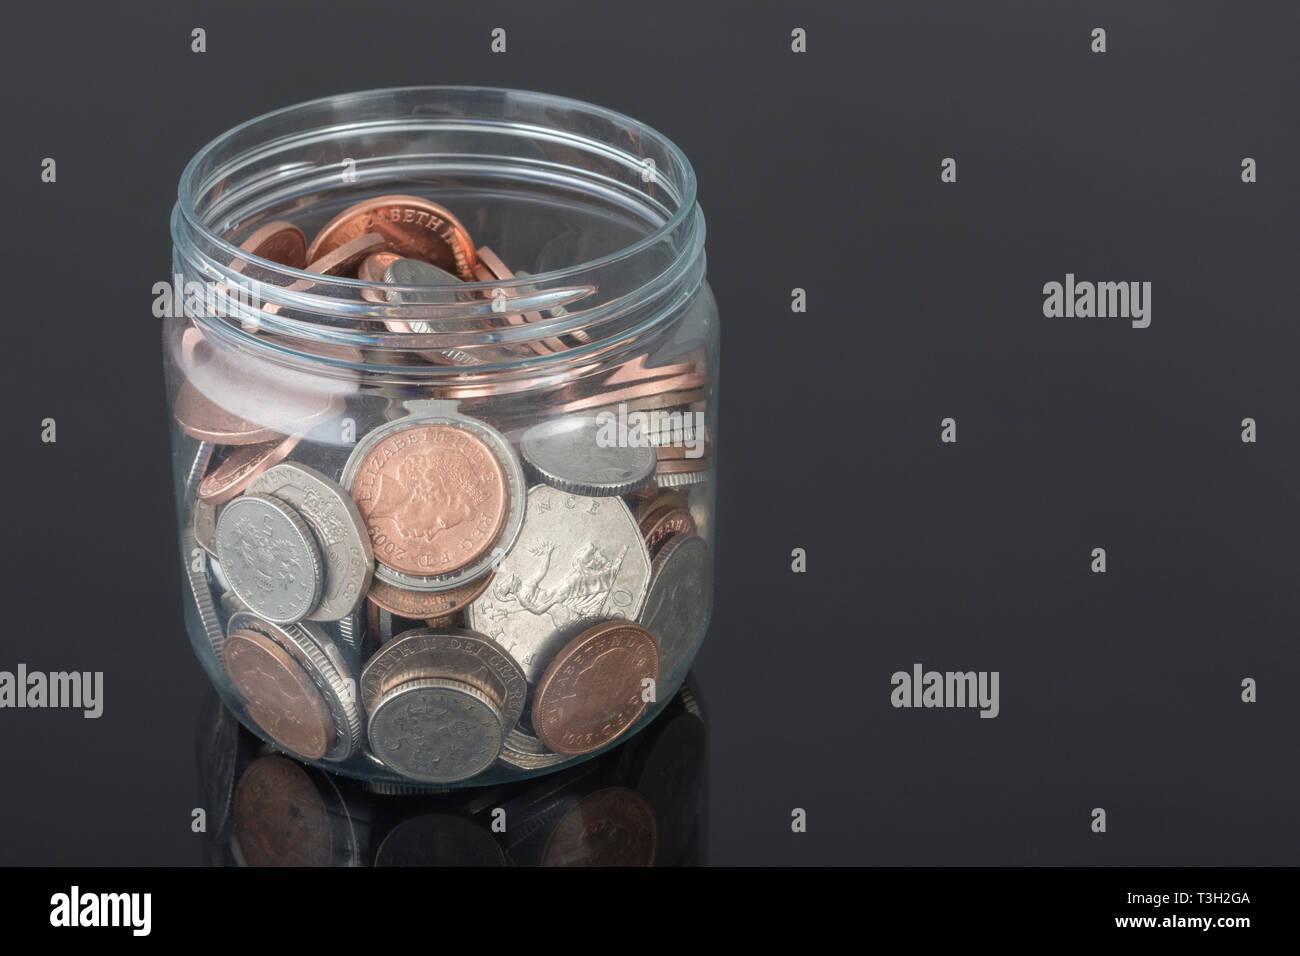 Plastic pot containing UK coins - as metaphor for personal savings, rainy day saving, pensions savings pot. - Stock Image